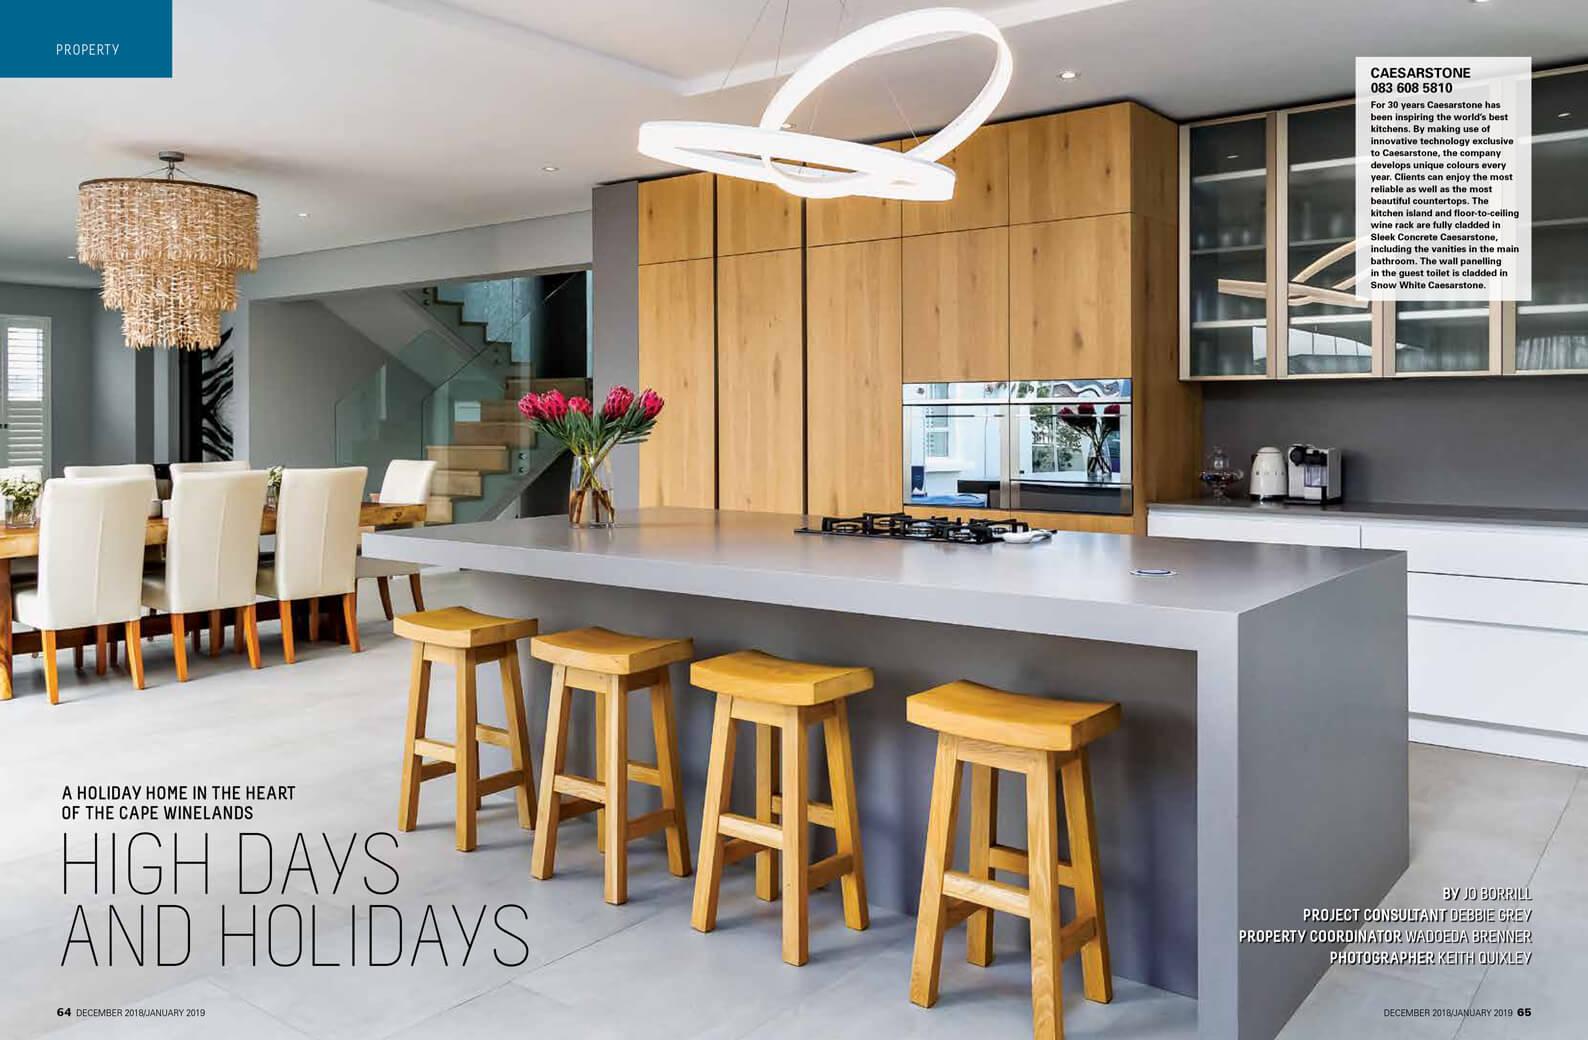 House Eggers Residential Project | Vanderbiljt Construction Project